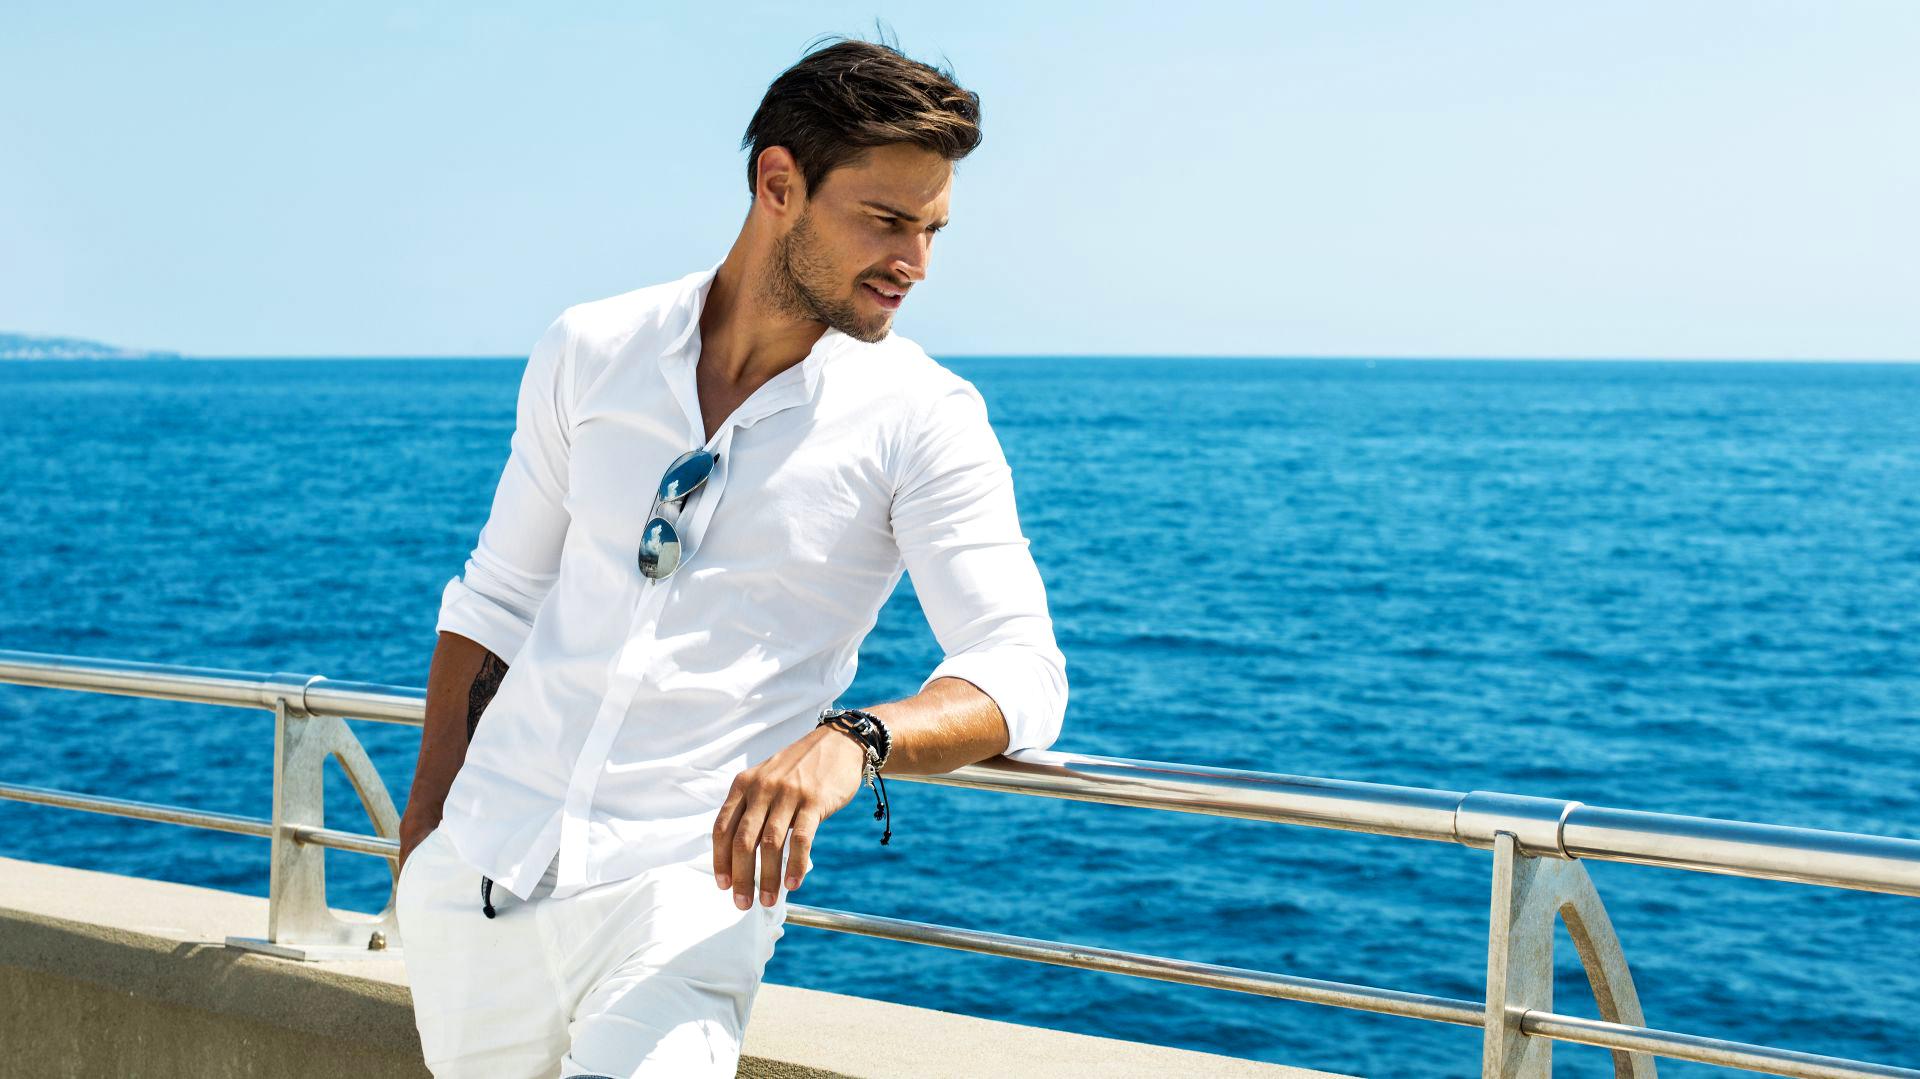 Men's smart casual dress code & attire